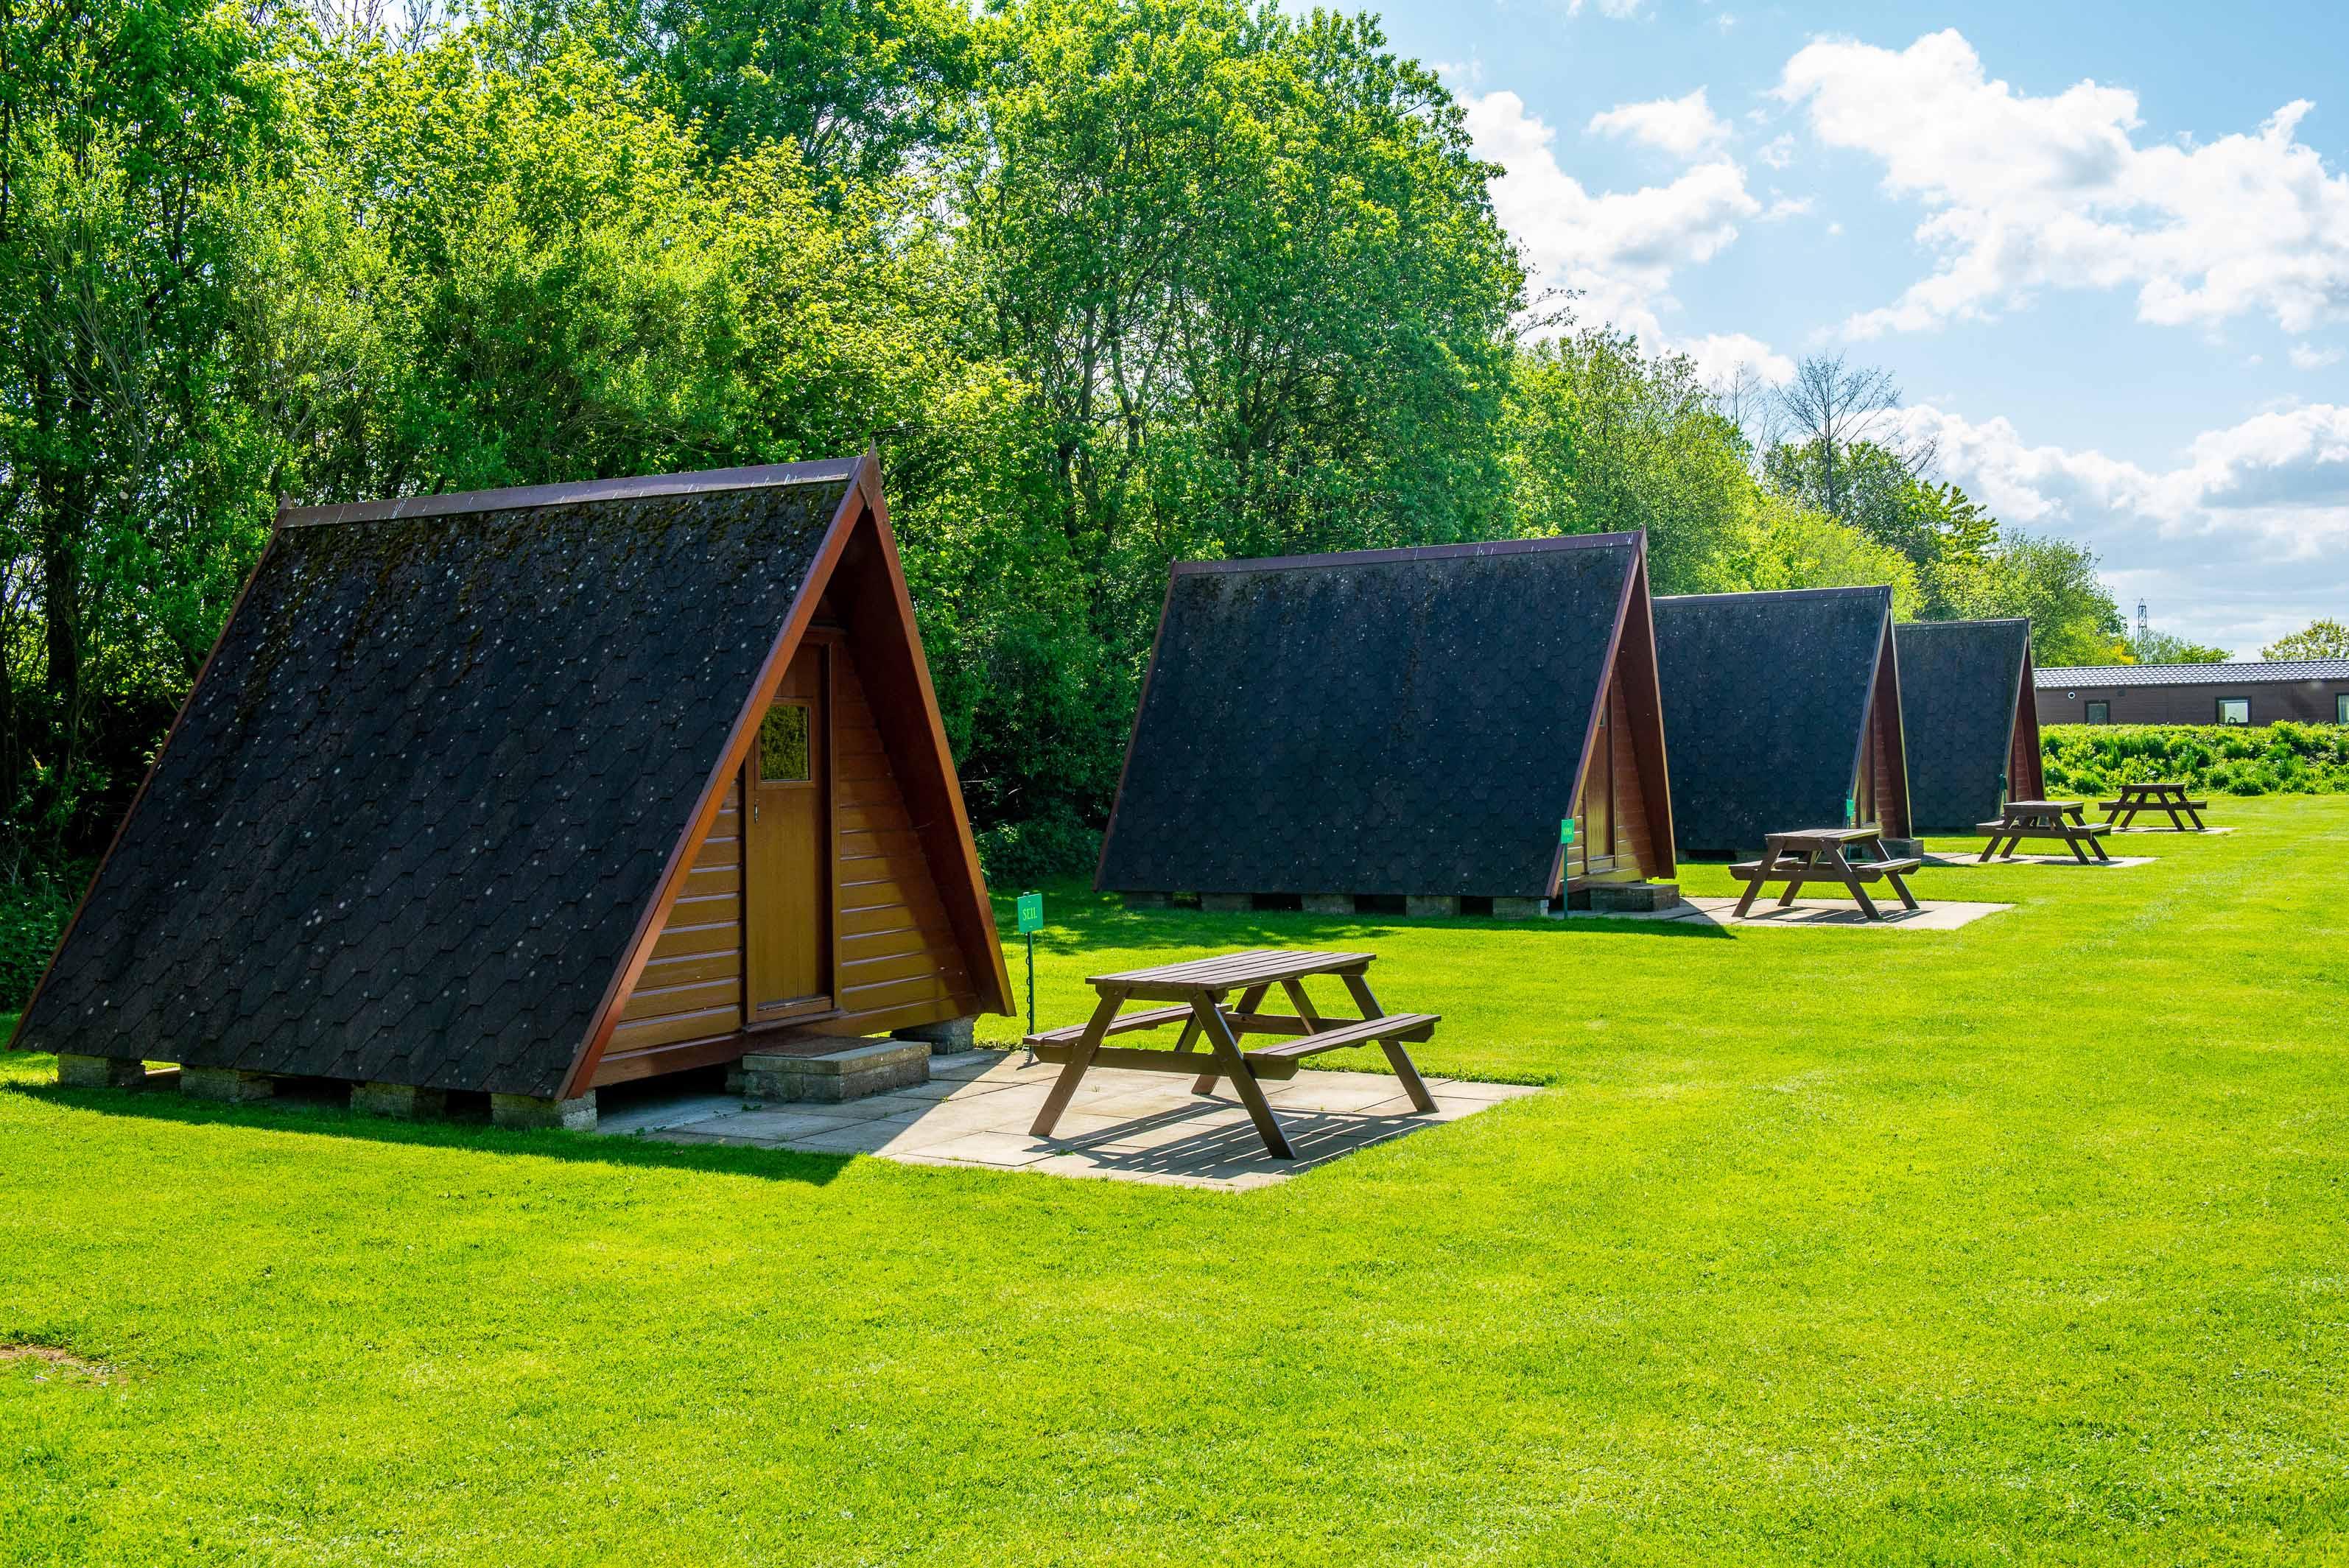 Linwater Caravan Park, Newbridge, Edinburgh  Camp site with